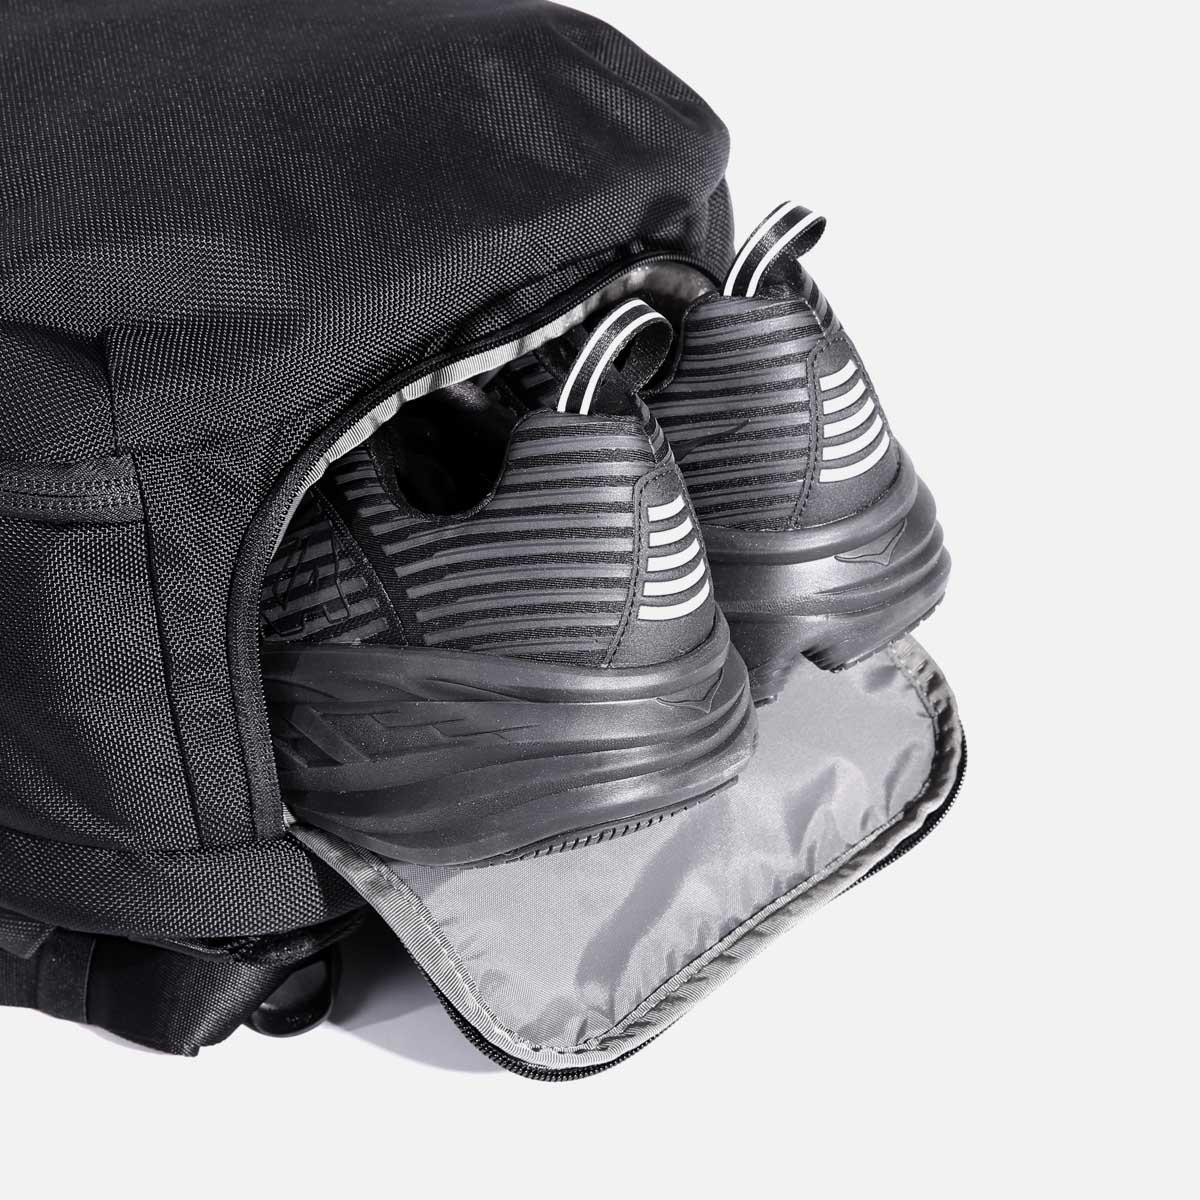 AER21022_travelpack2small_shoepocket.jpg